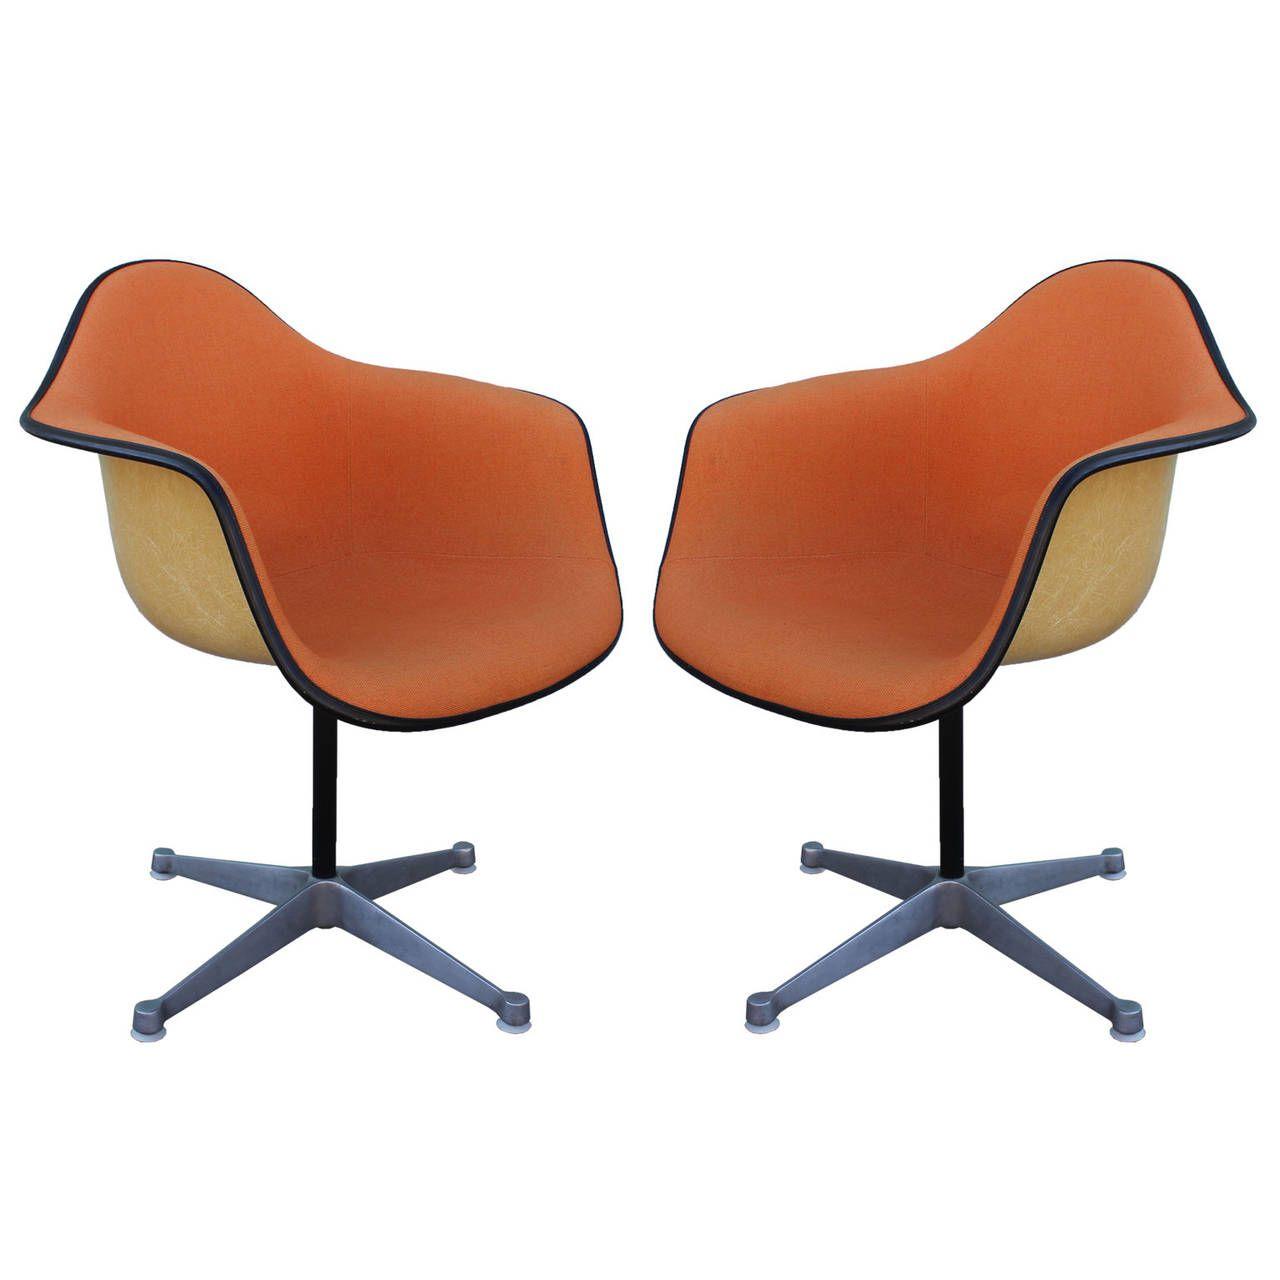 Antique bucket chair - Pair Of Herman Miller Eames Swivel Bucket Chairs